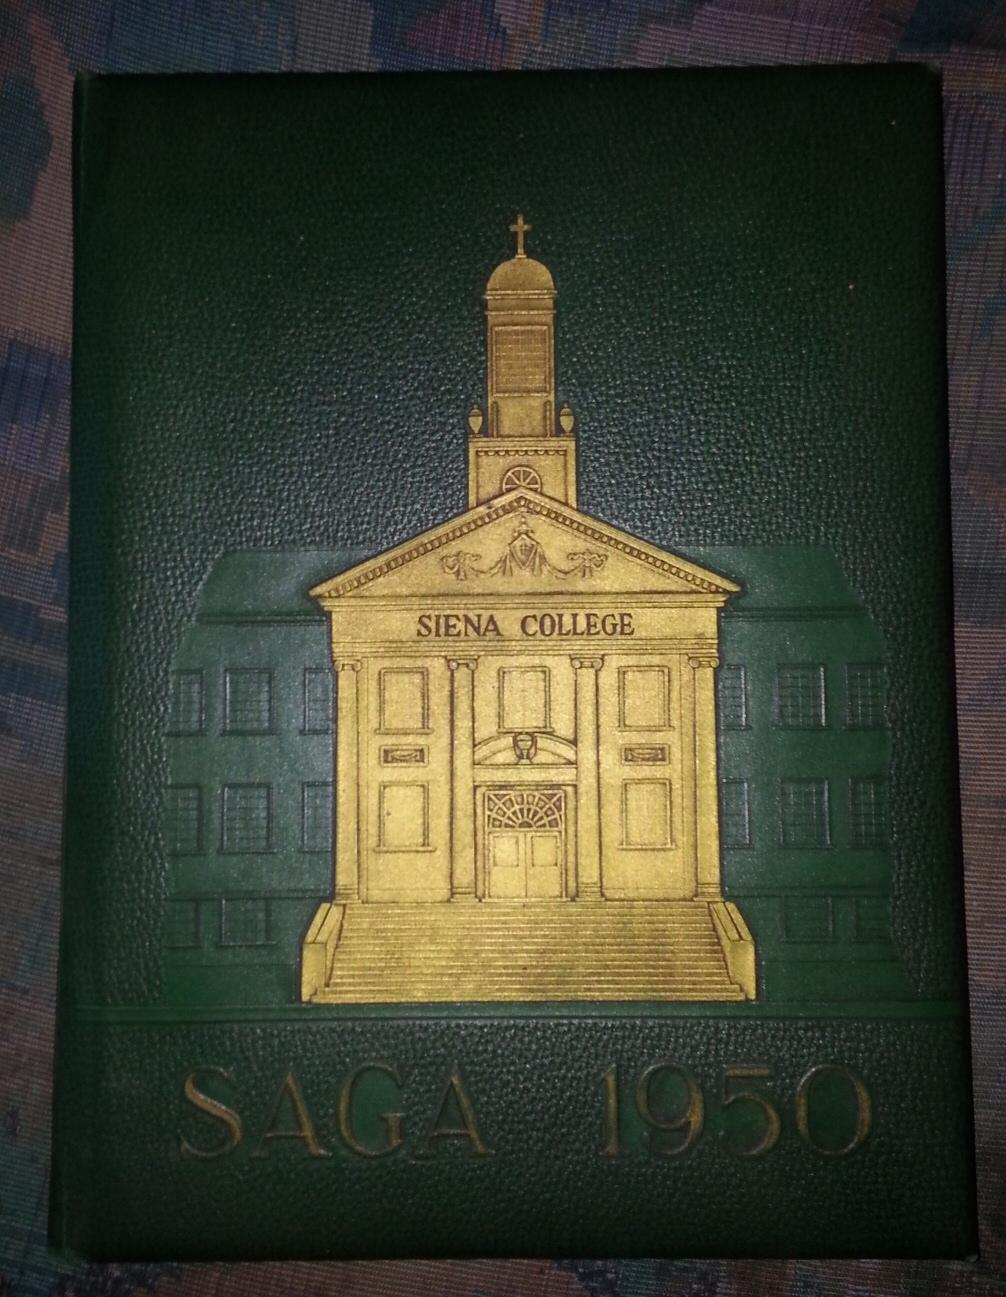 Saga - 1950 - Yearbook, Siena College - (Loudonville, New York)